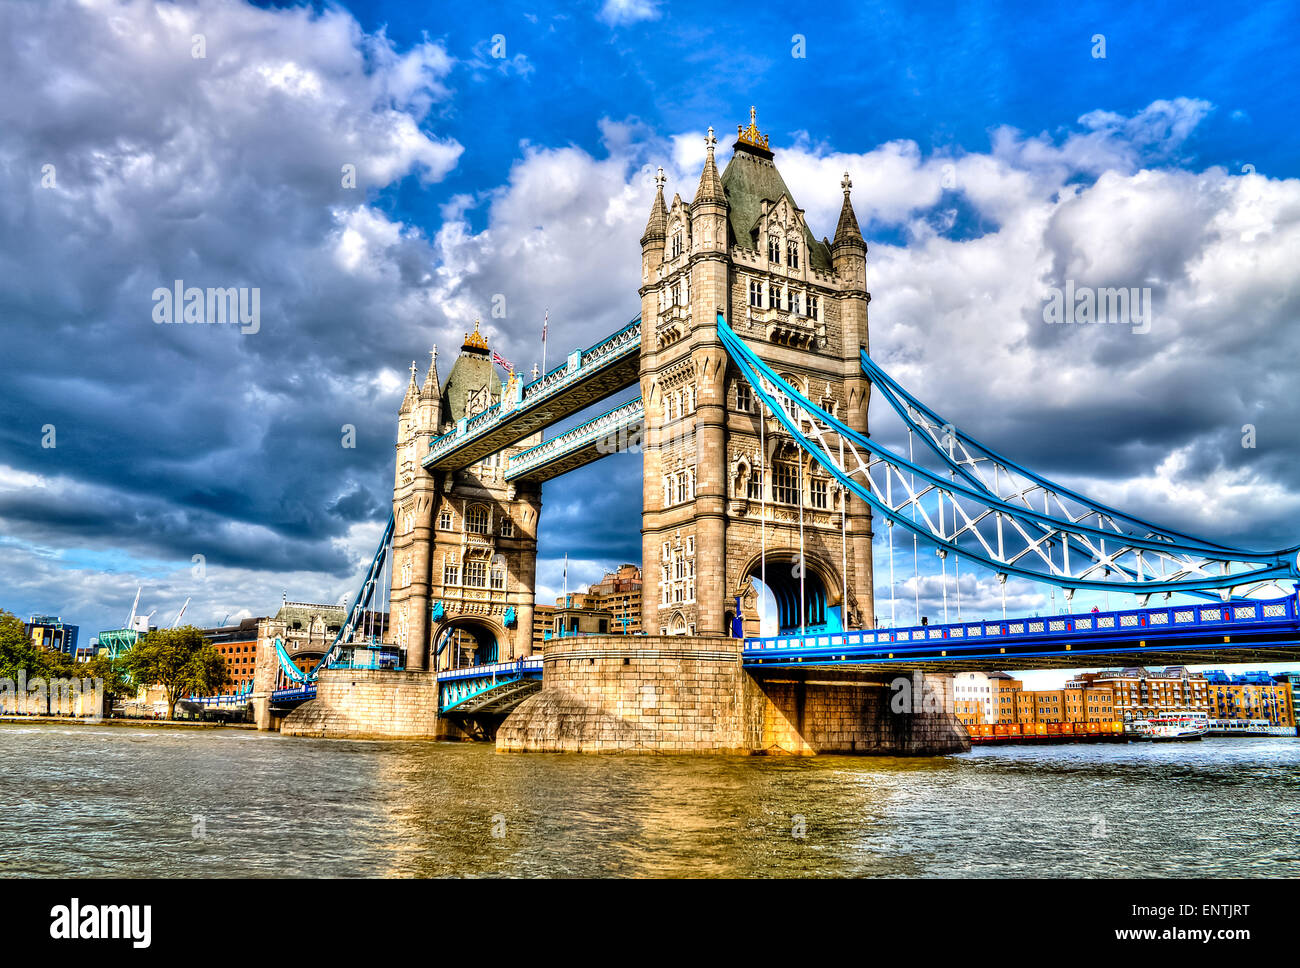 Tower Bridge, famous combined bascule and suspension bridge which crosses River Thames. London, United Kingdom. - Stock Image